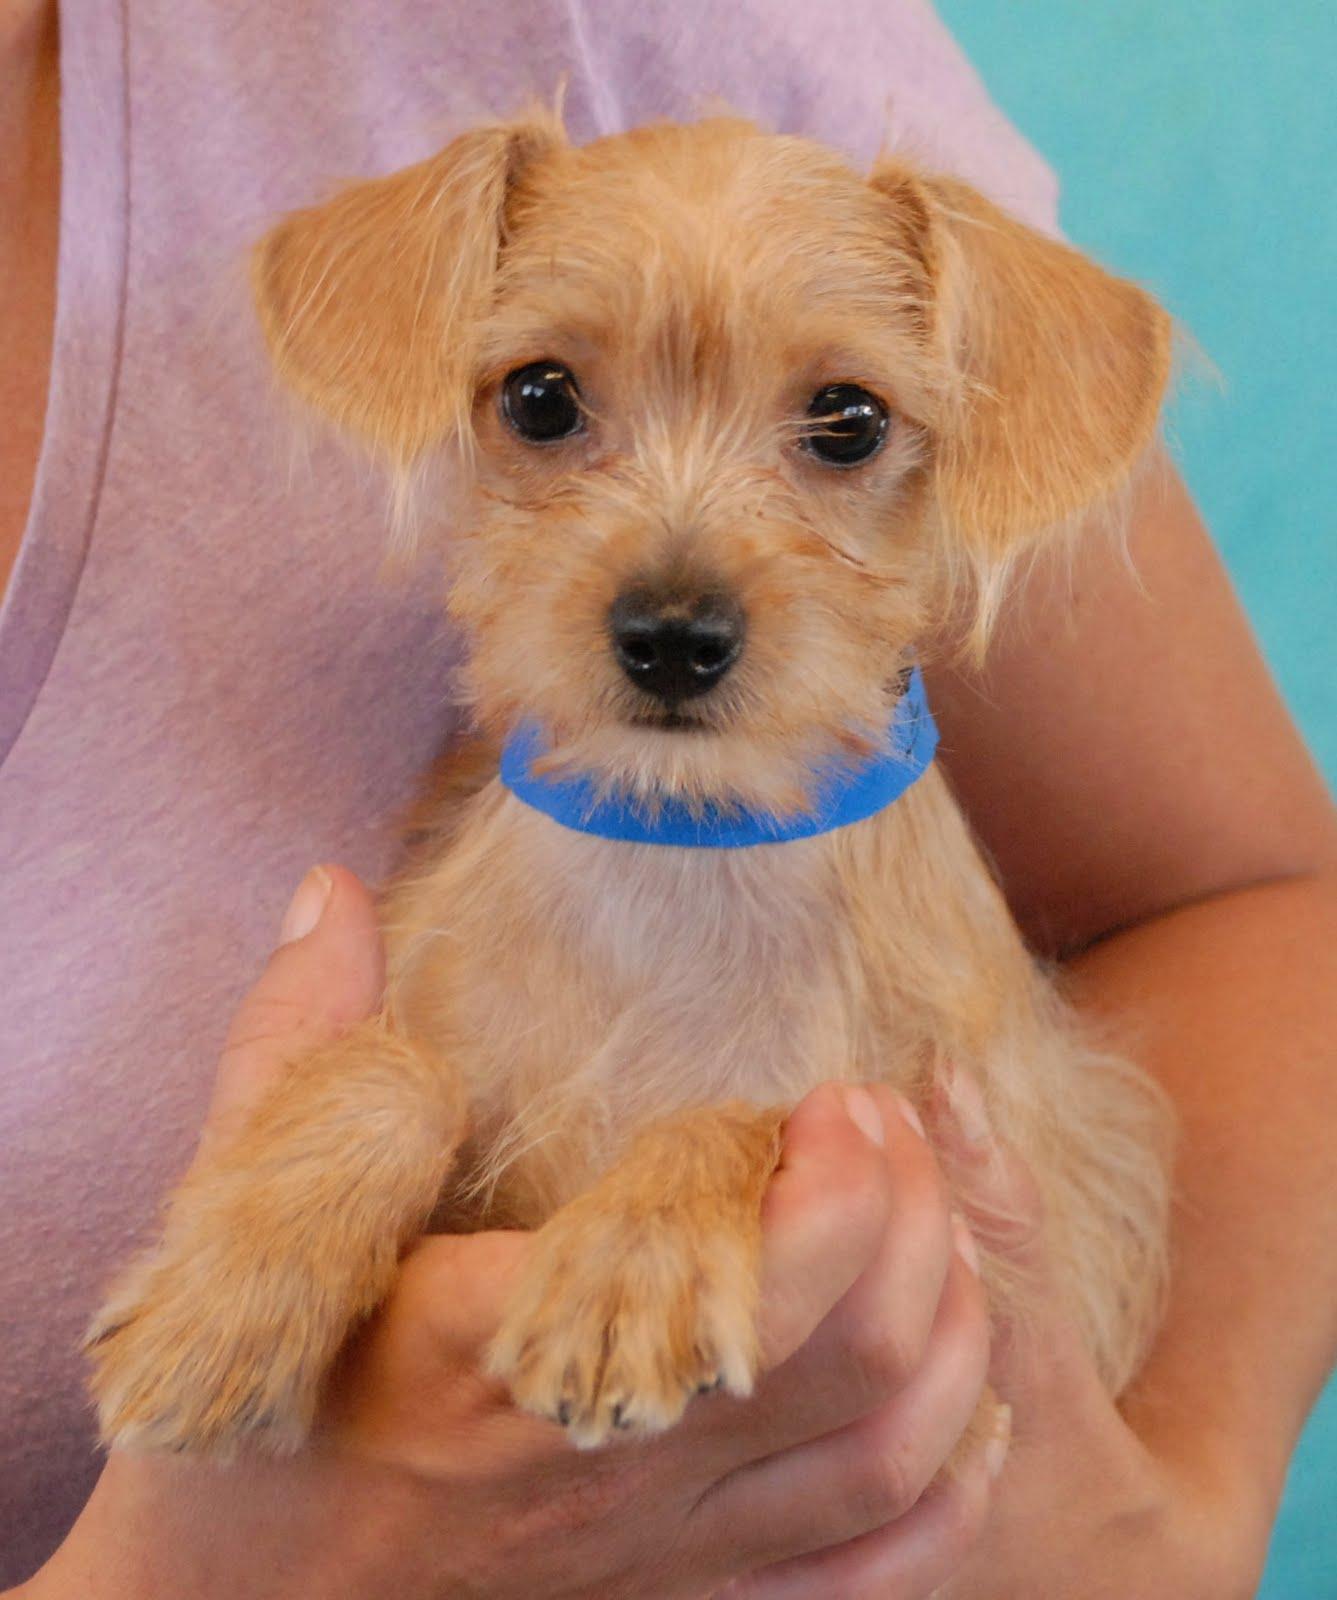 Adoption: Nevada SPCA Animal Rescue: The Brady Bunch Puppies Debut